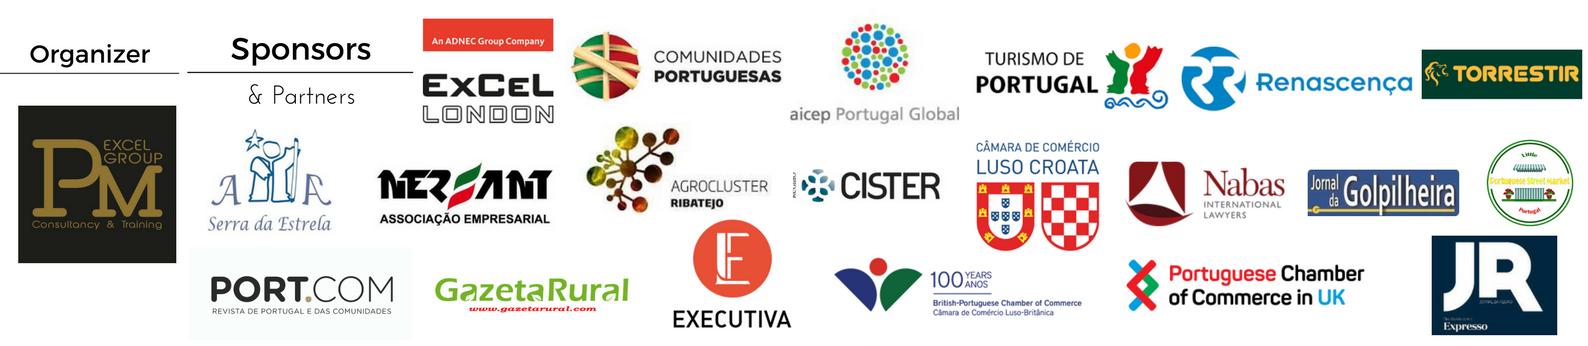 Logos Event Organizer, Sponsors & Partners